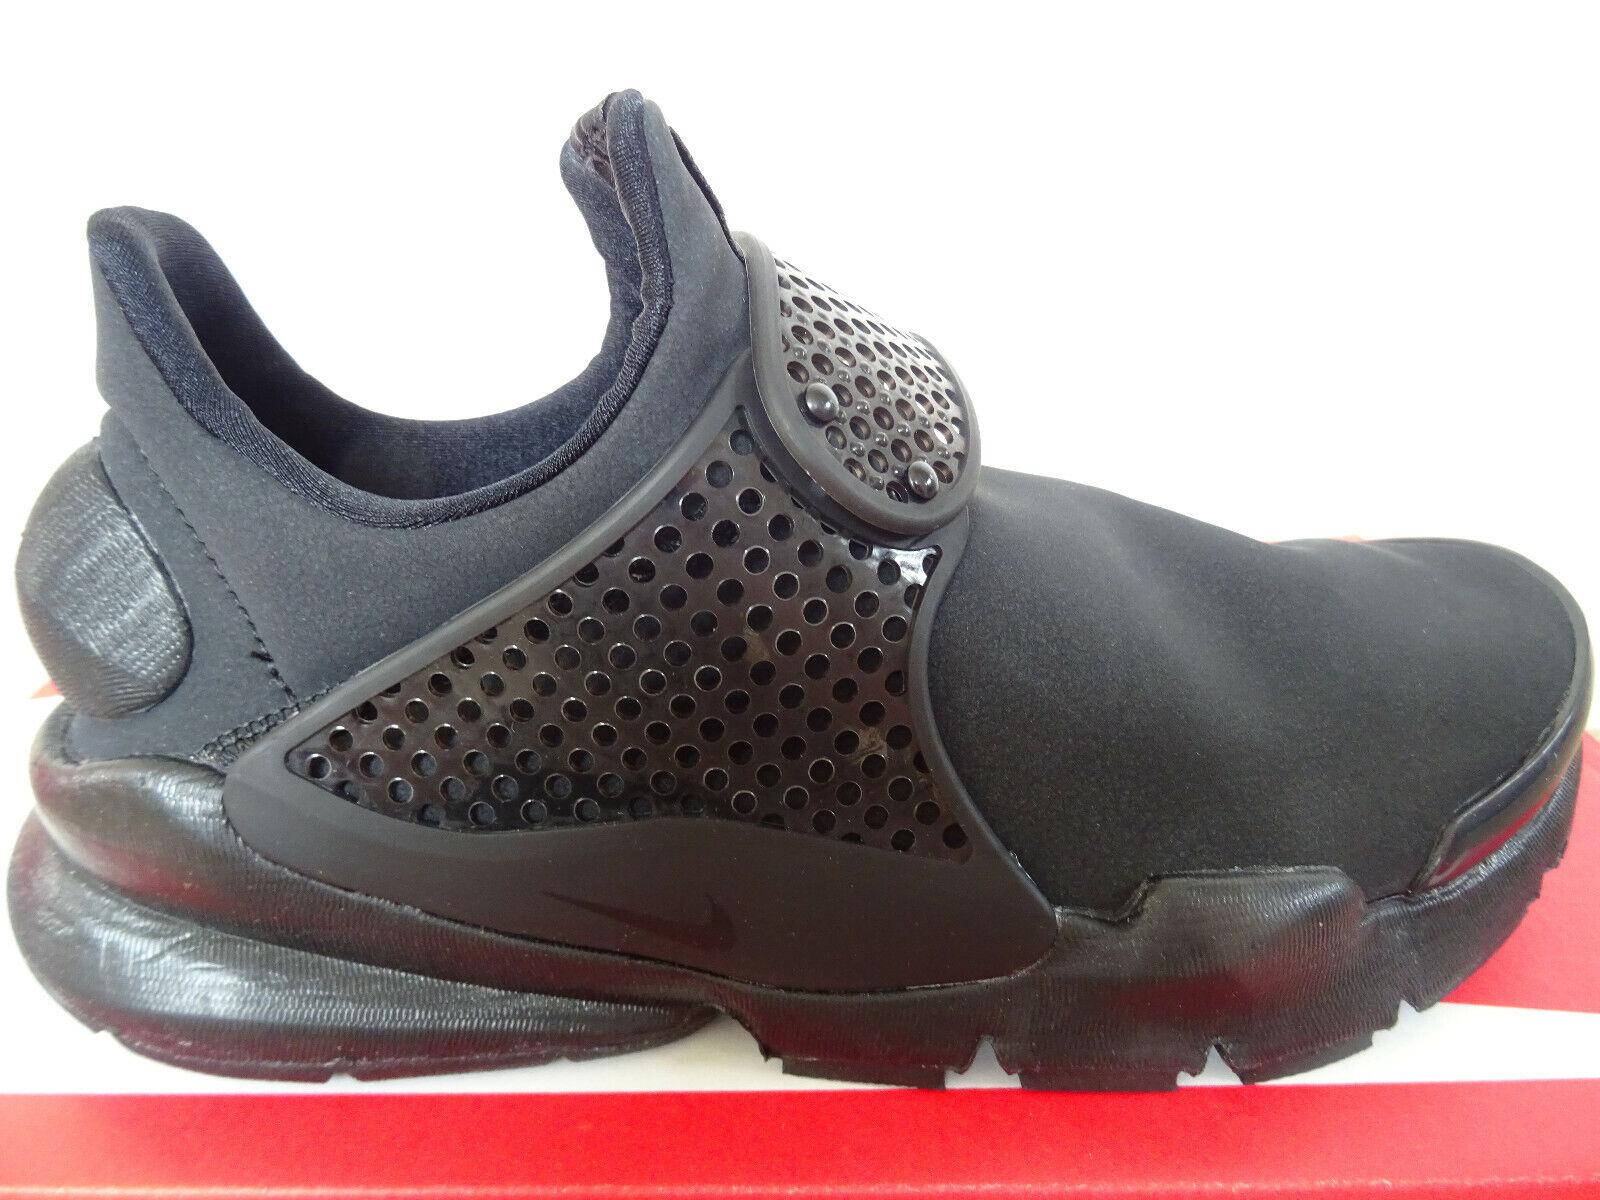 Nike Sock Dart PRM womens trainers shoes 881186 004 uk 4.5 eu 38 us 7 NEW+BOX